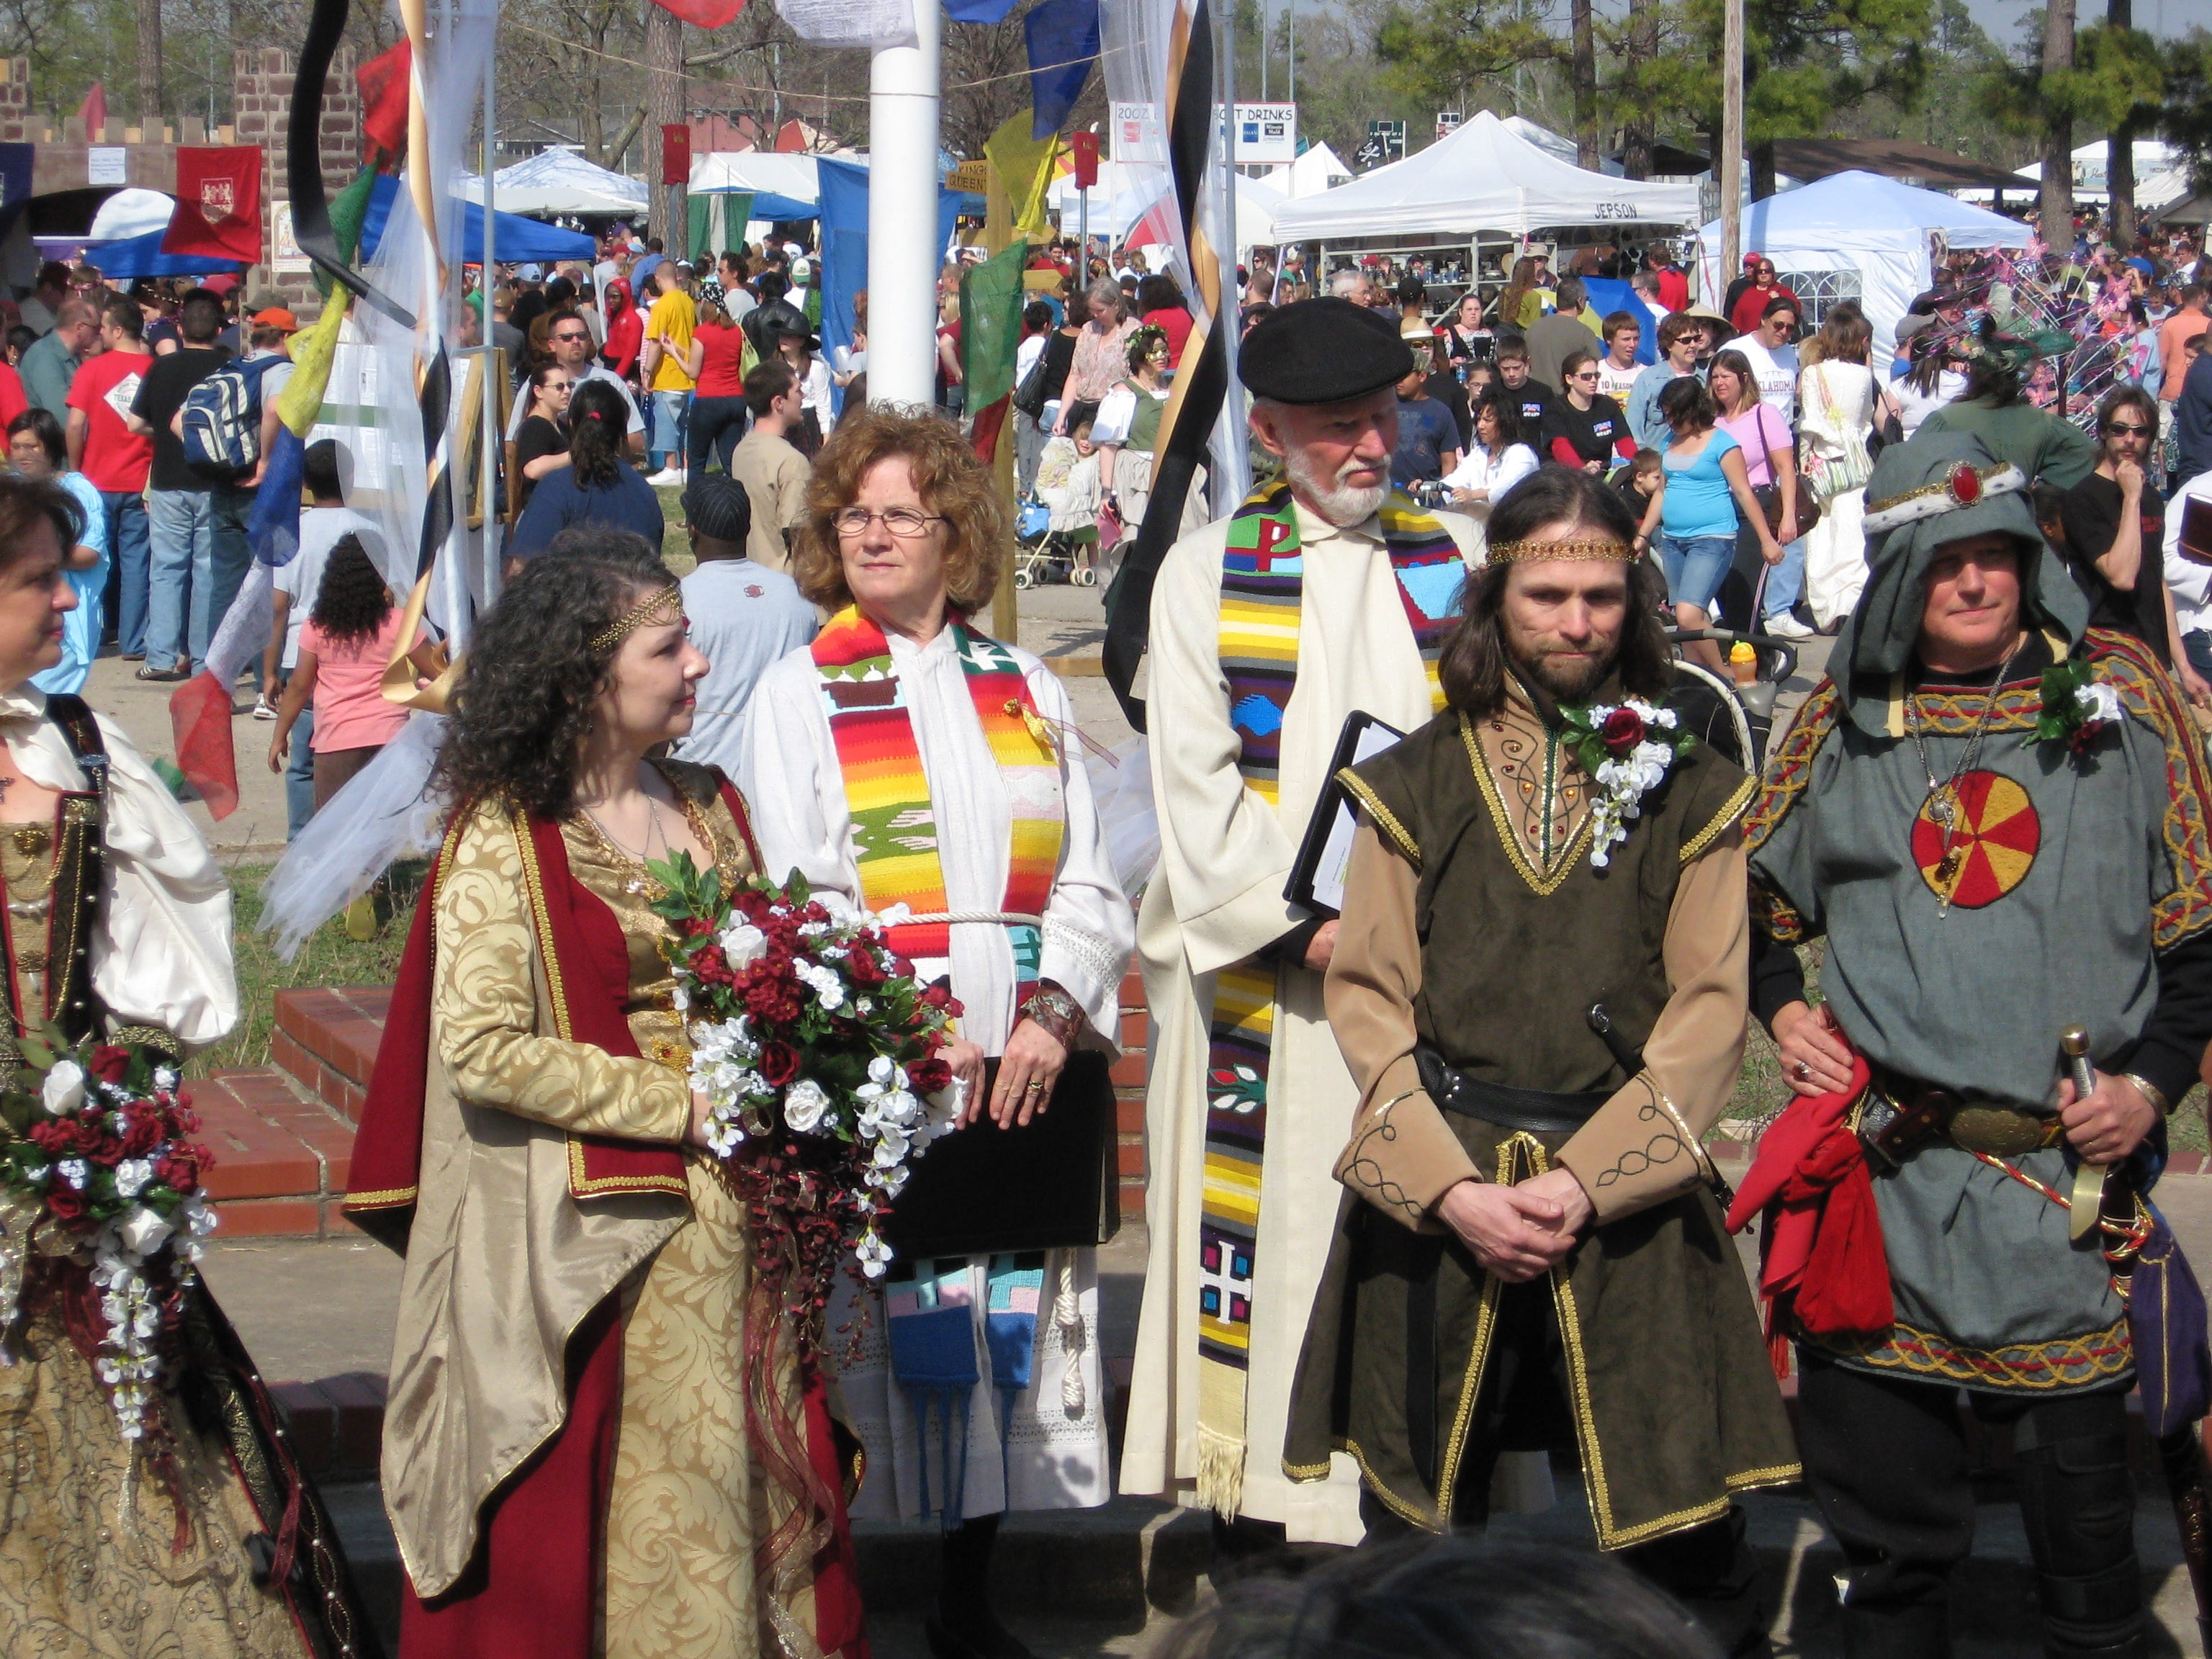 Road Trip Oklahoma Explores Medieval Fair